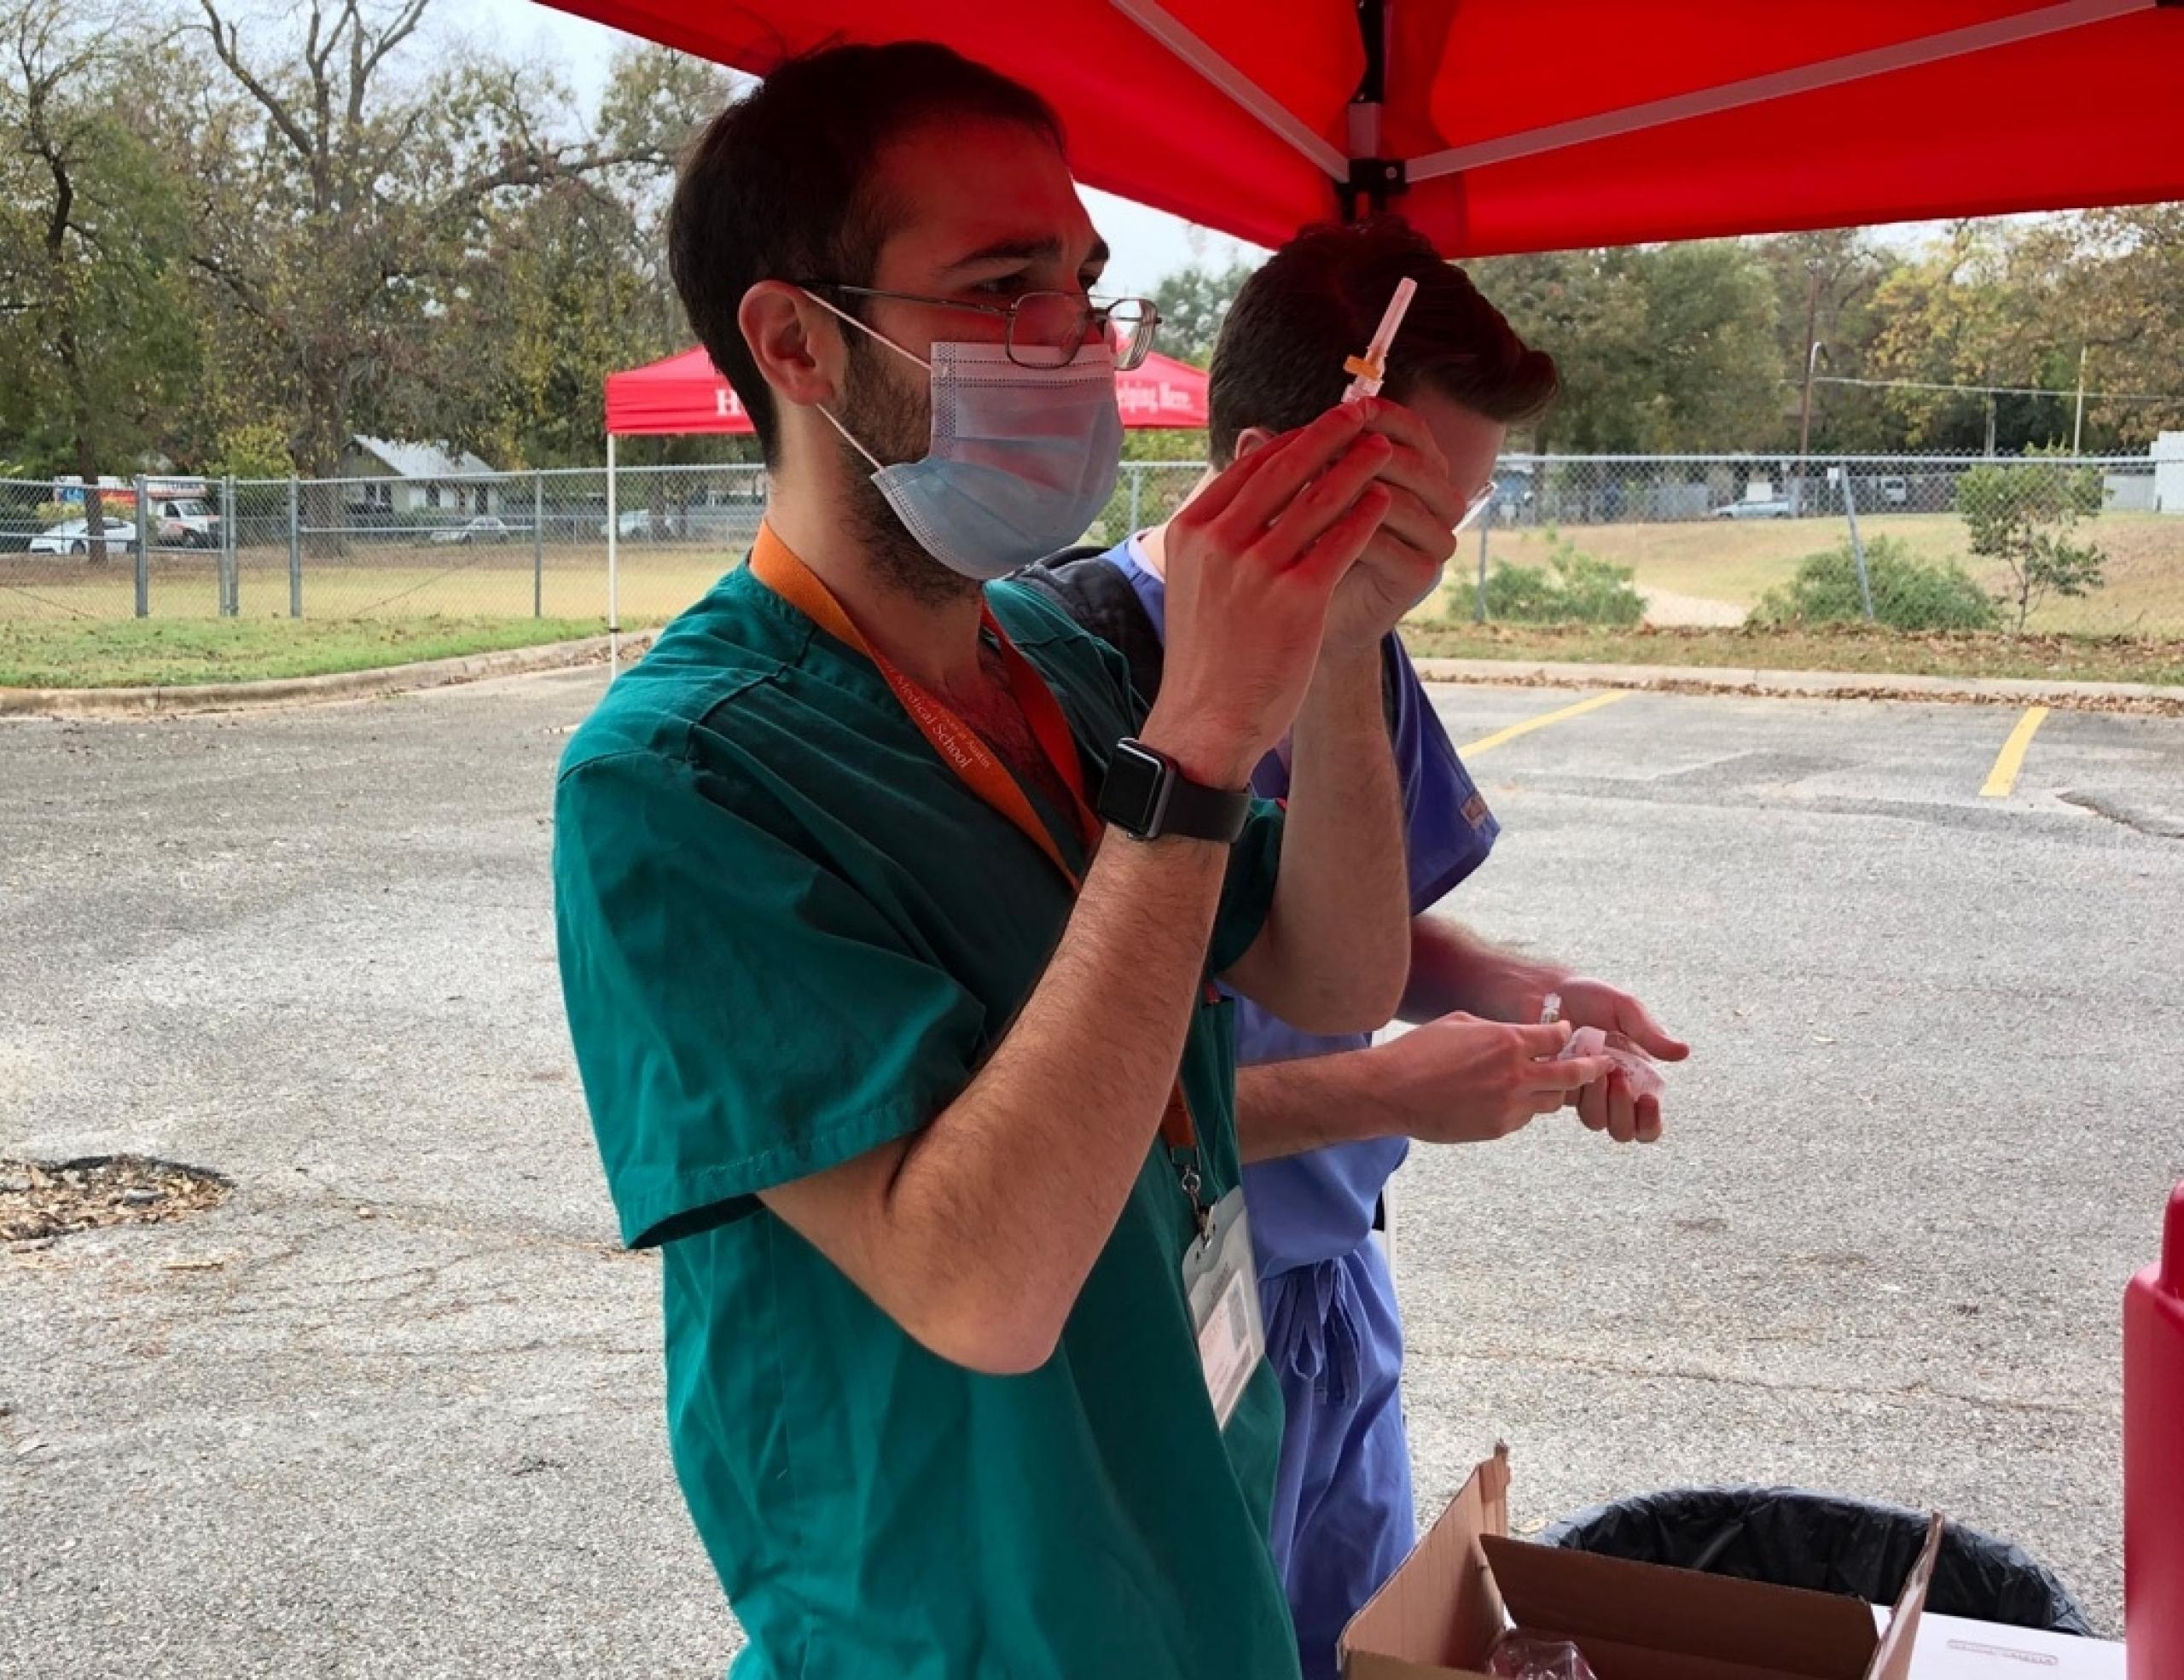 A Dell Med student preparing a flu shot.